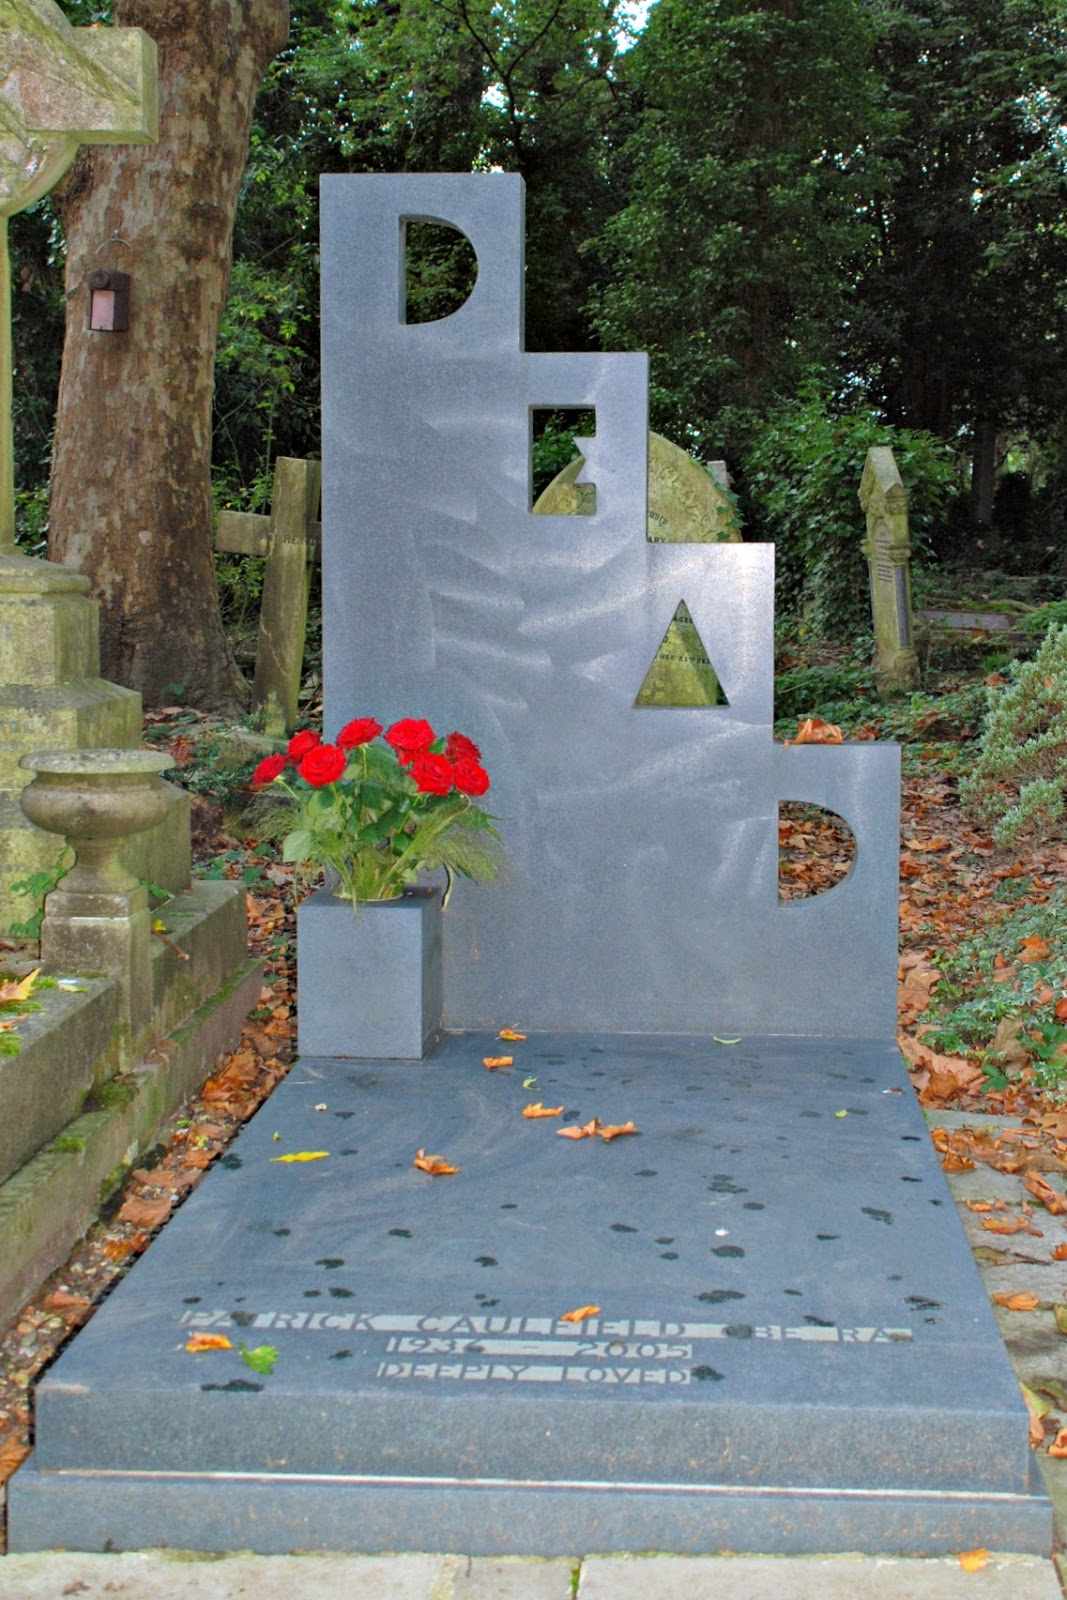 Patrick Caulfield's memorial, Highgate Cemetery, London